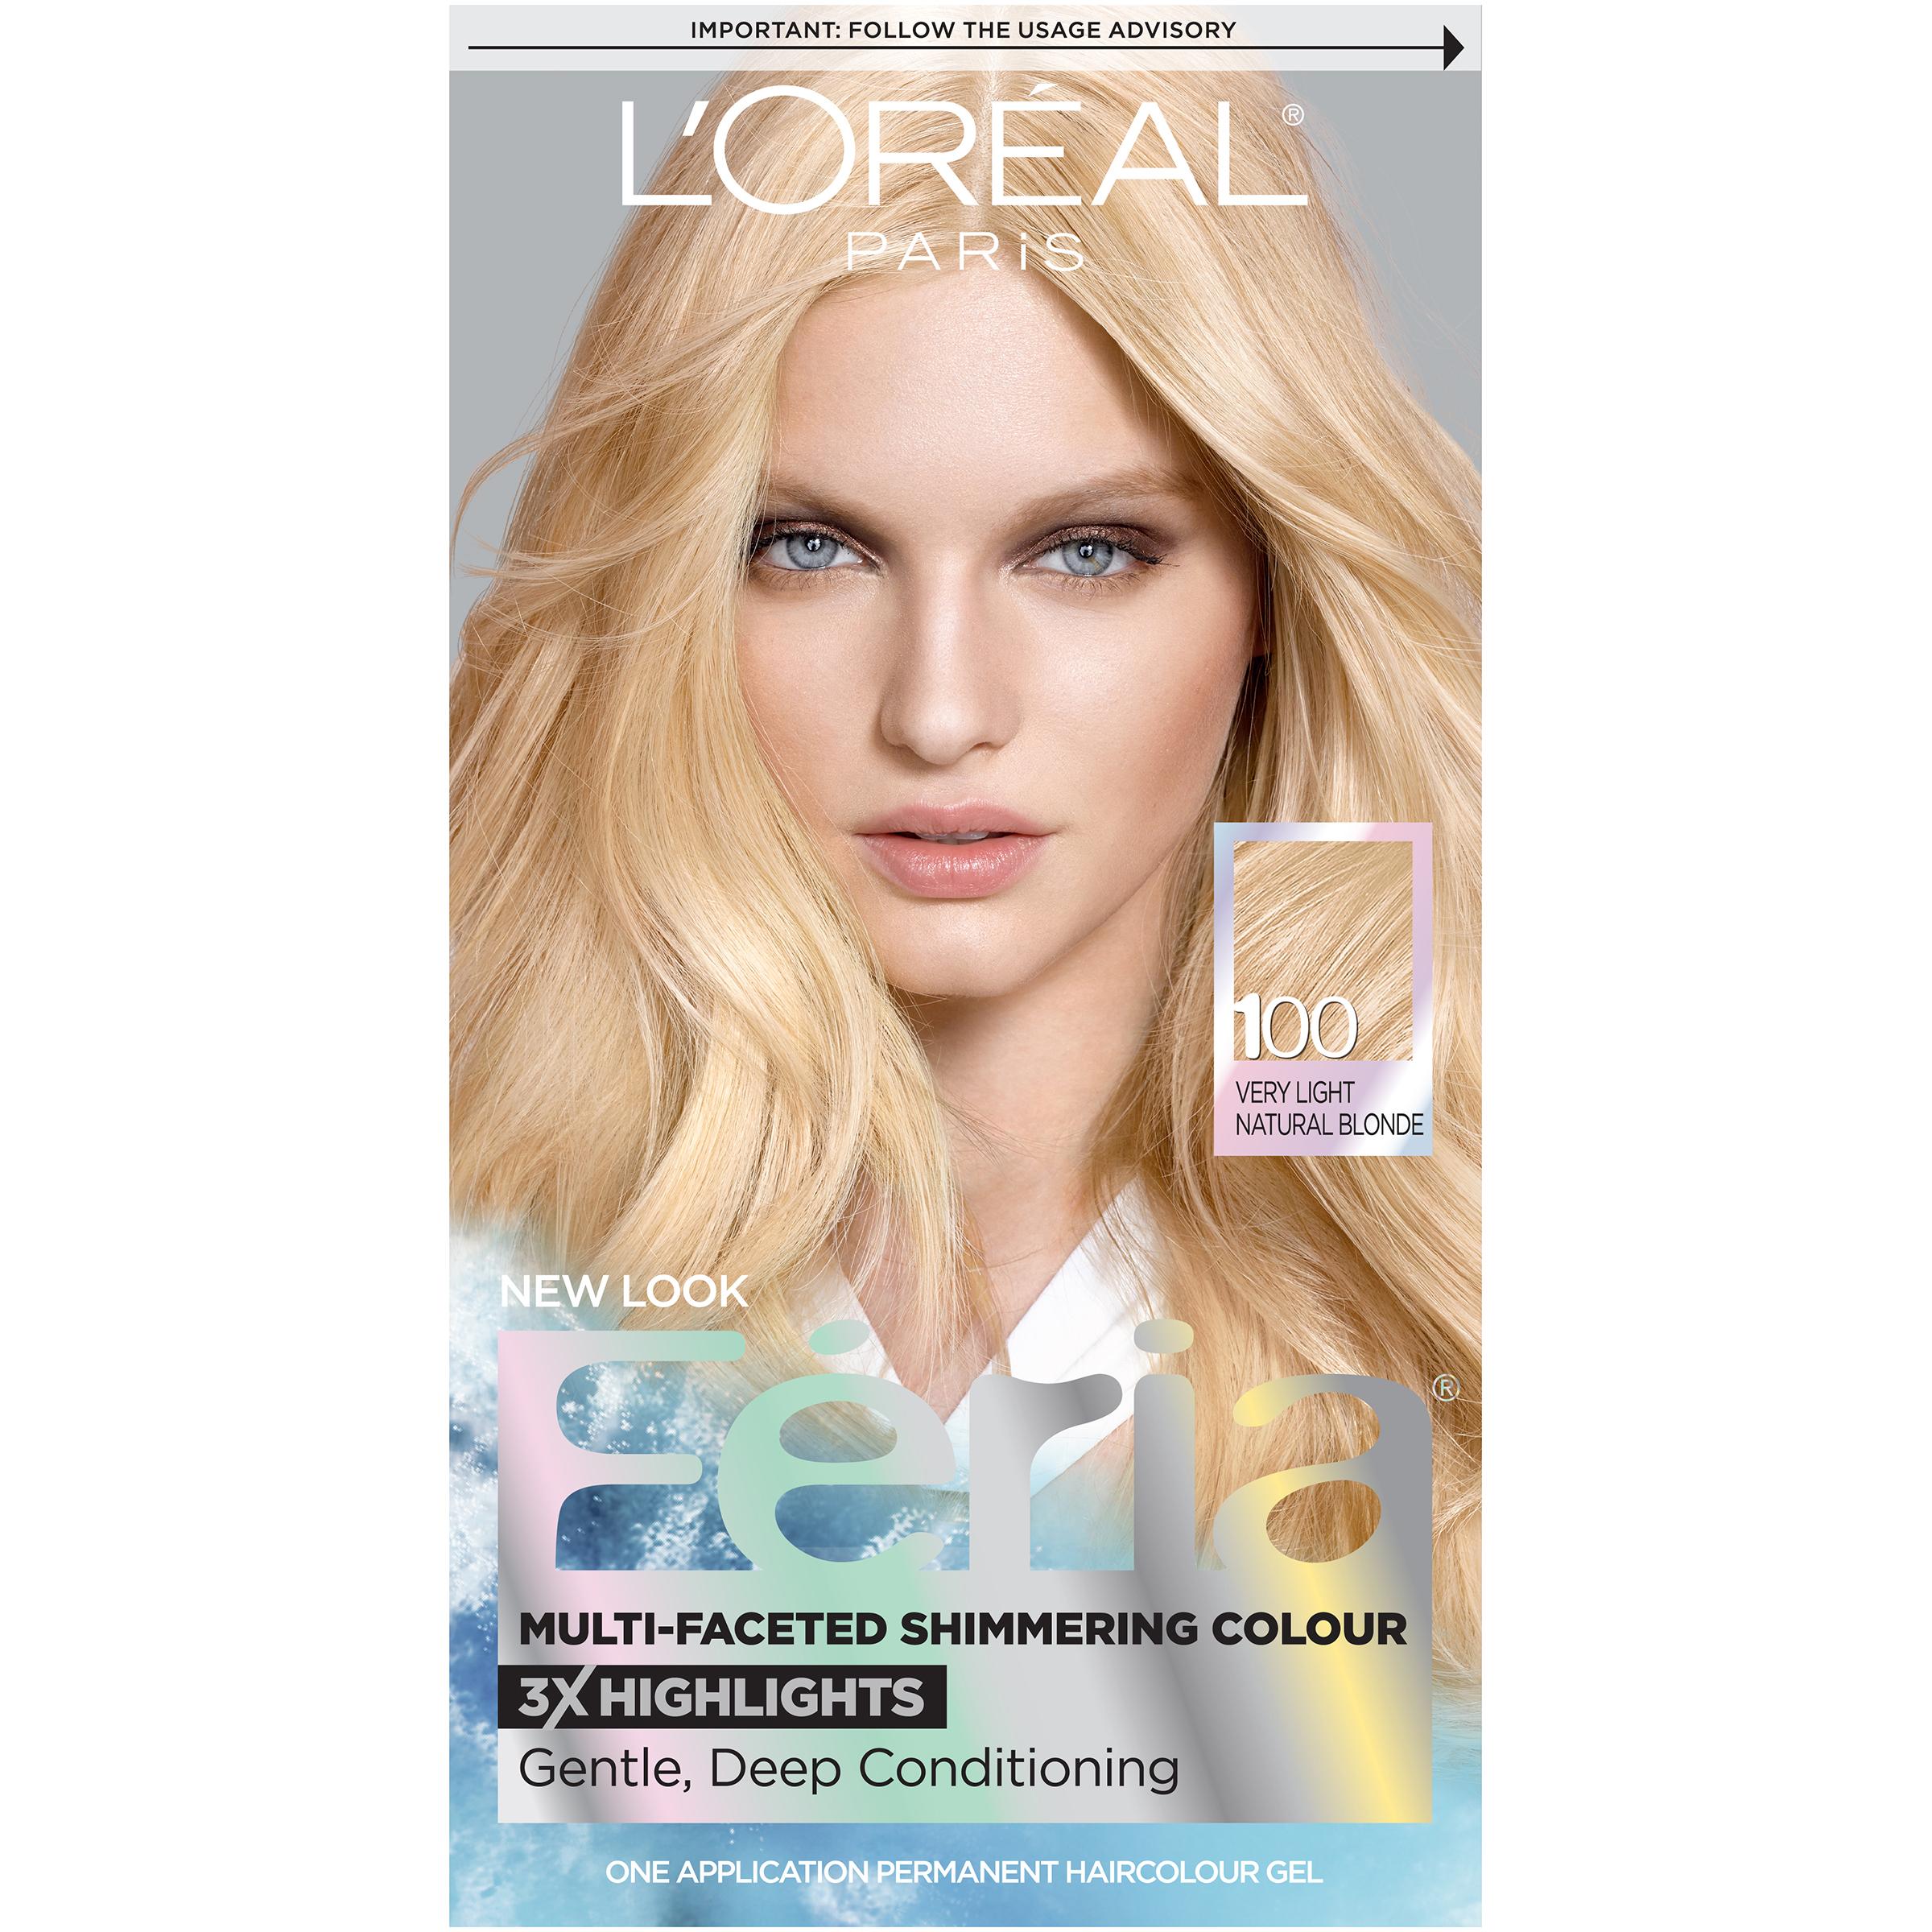 Loral Paris Feria Permanent Hair Color Martlocal